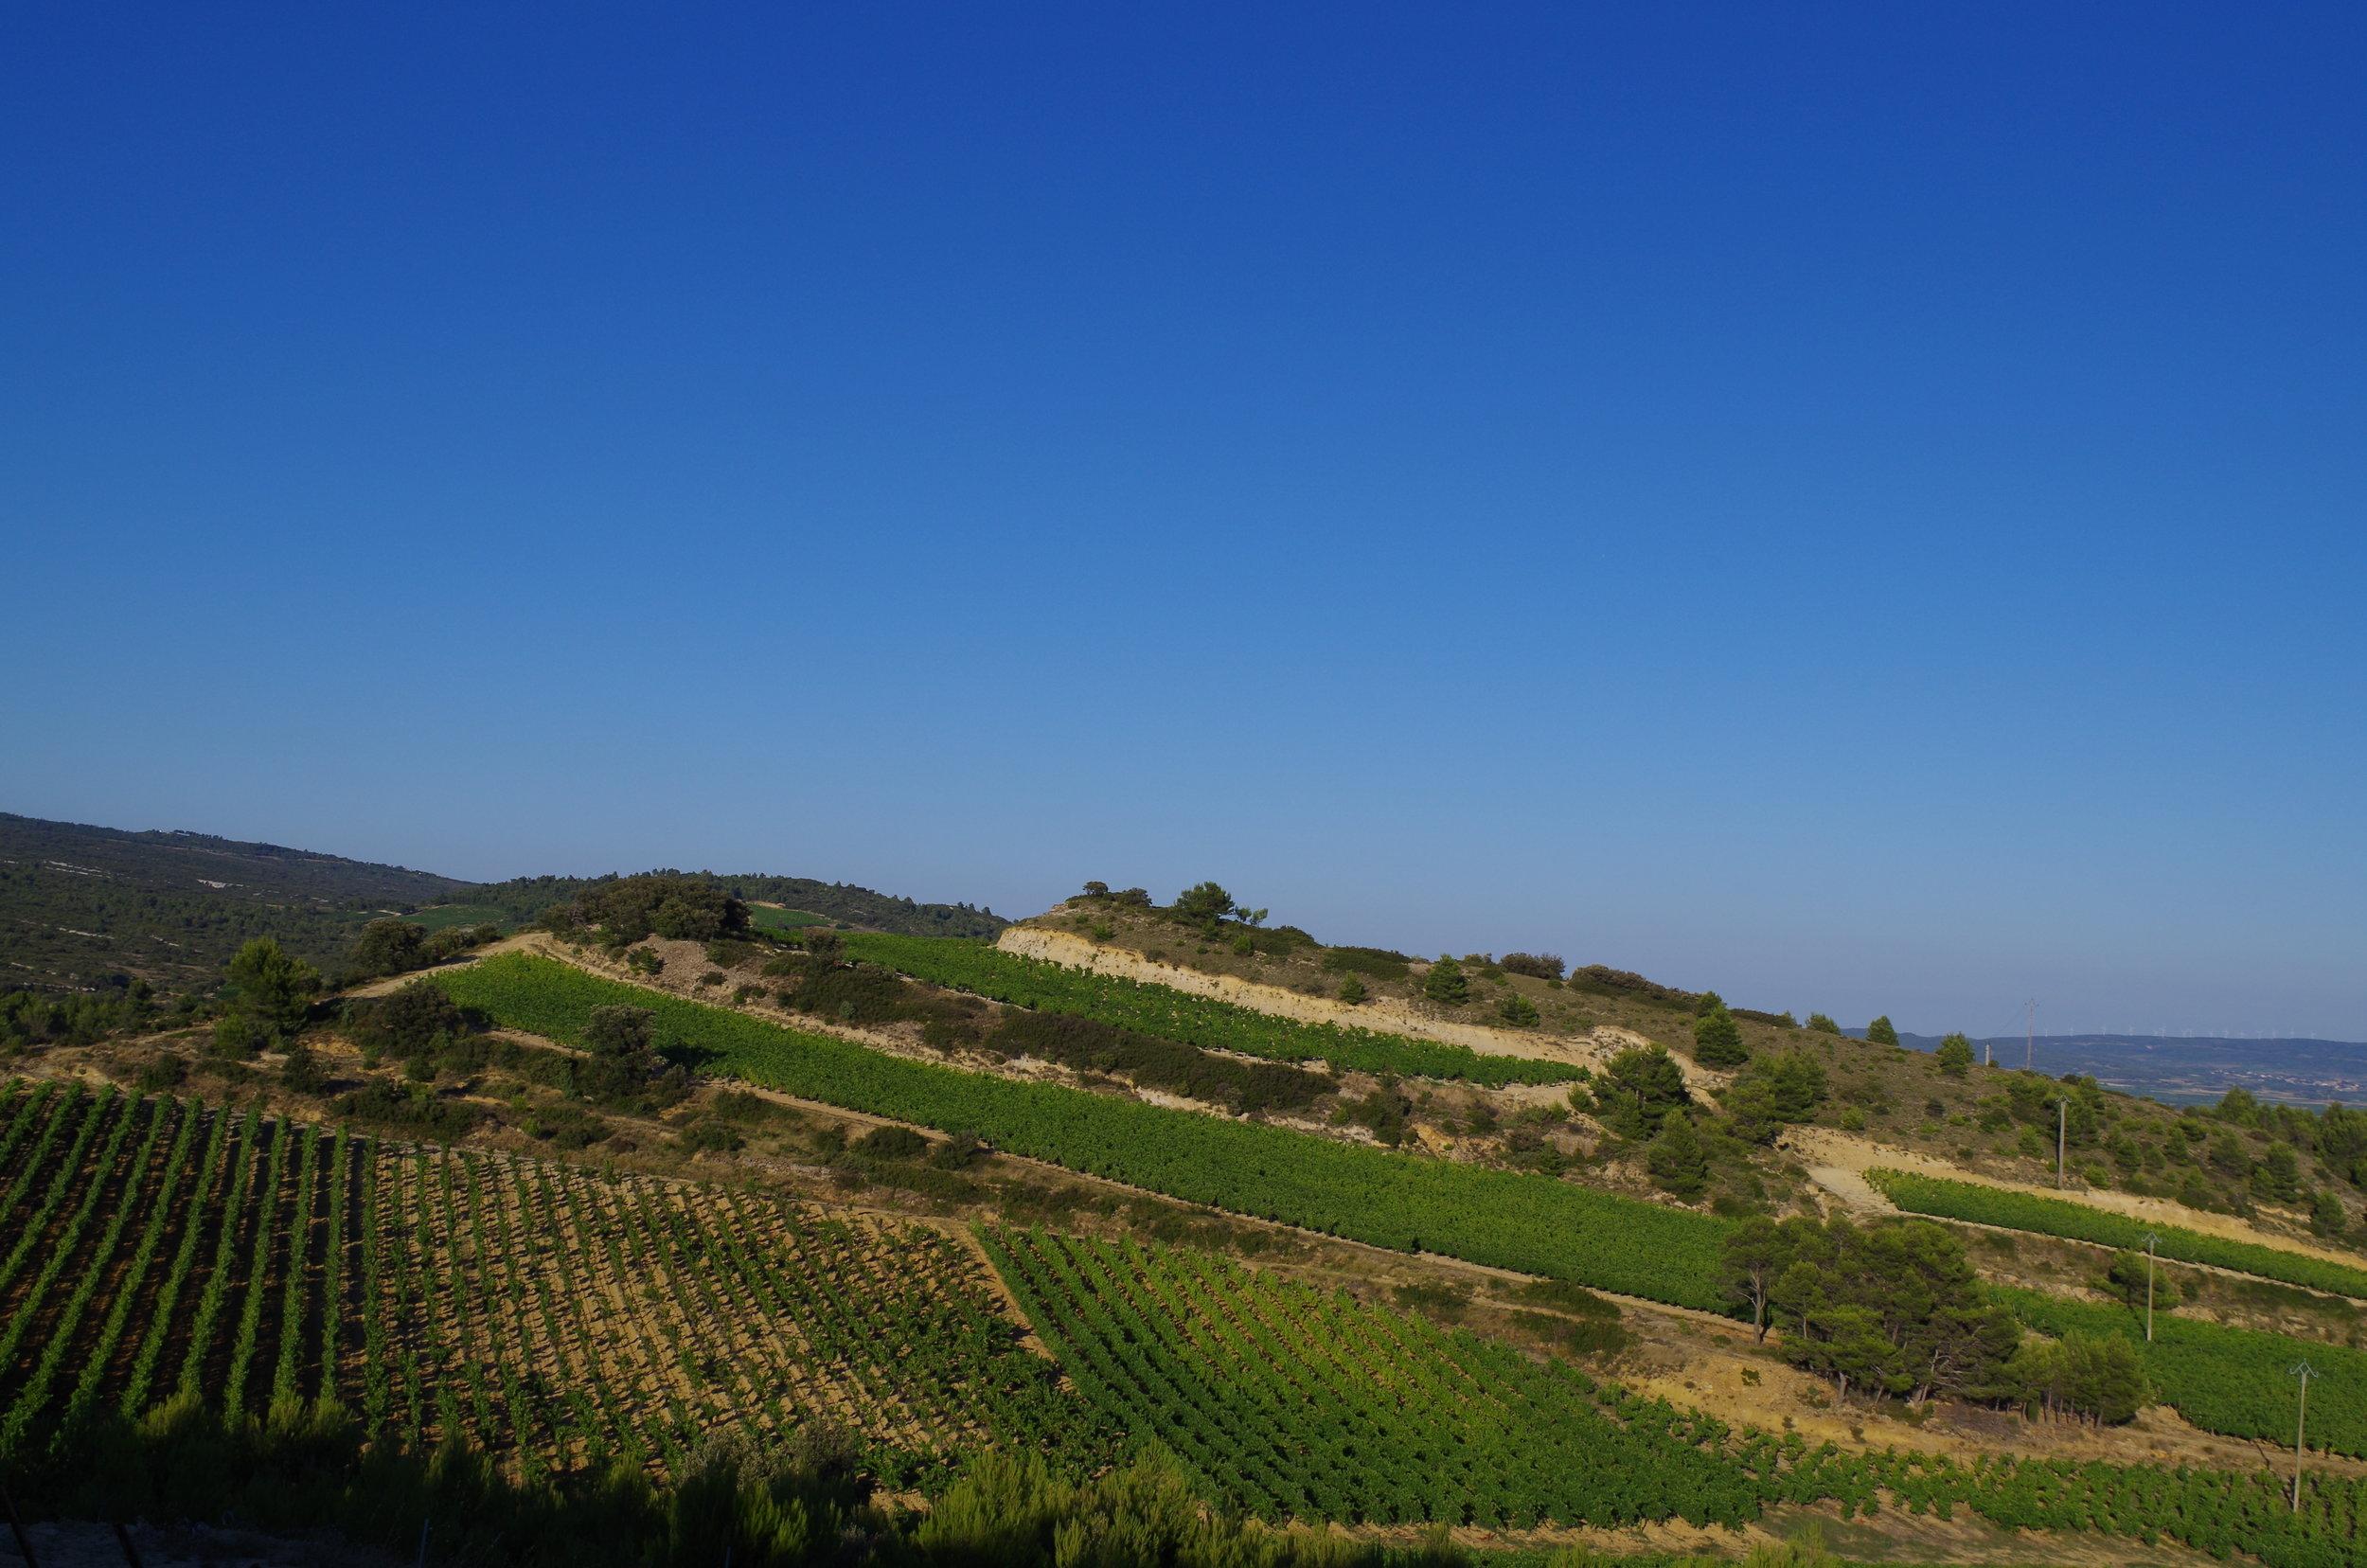 Combes Grenache vineyard - HIGH RES -  jacques herviou.JPG